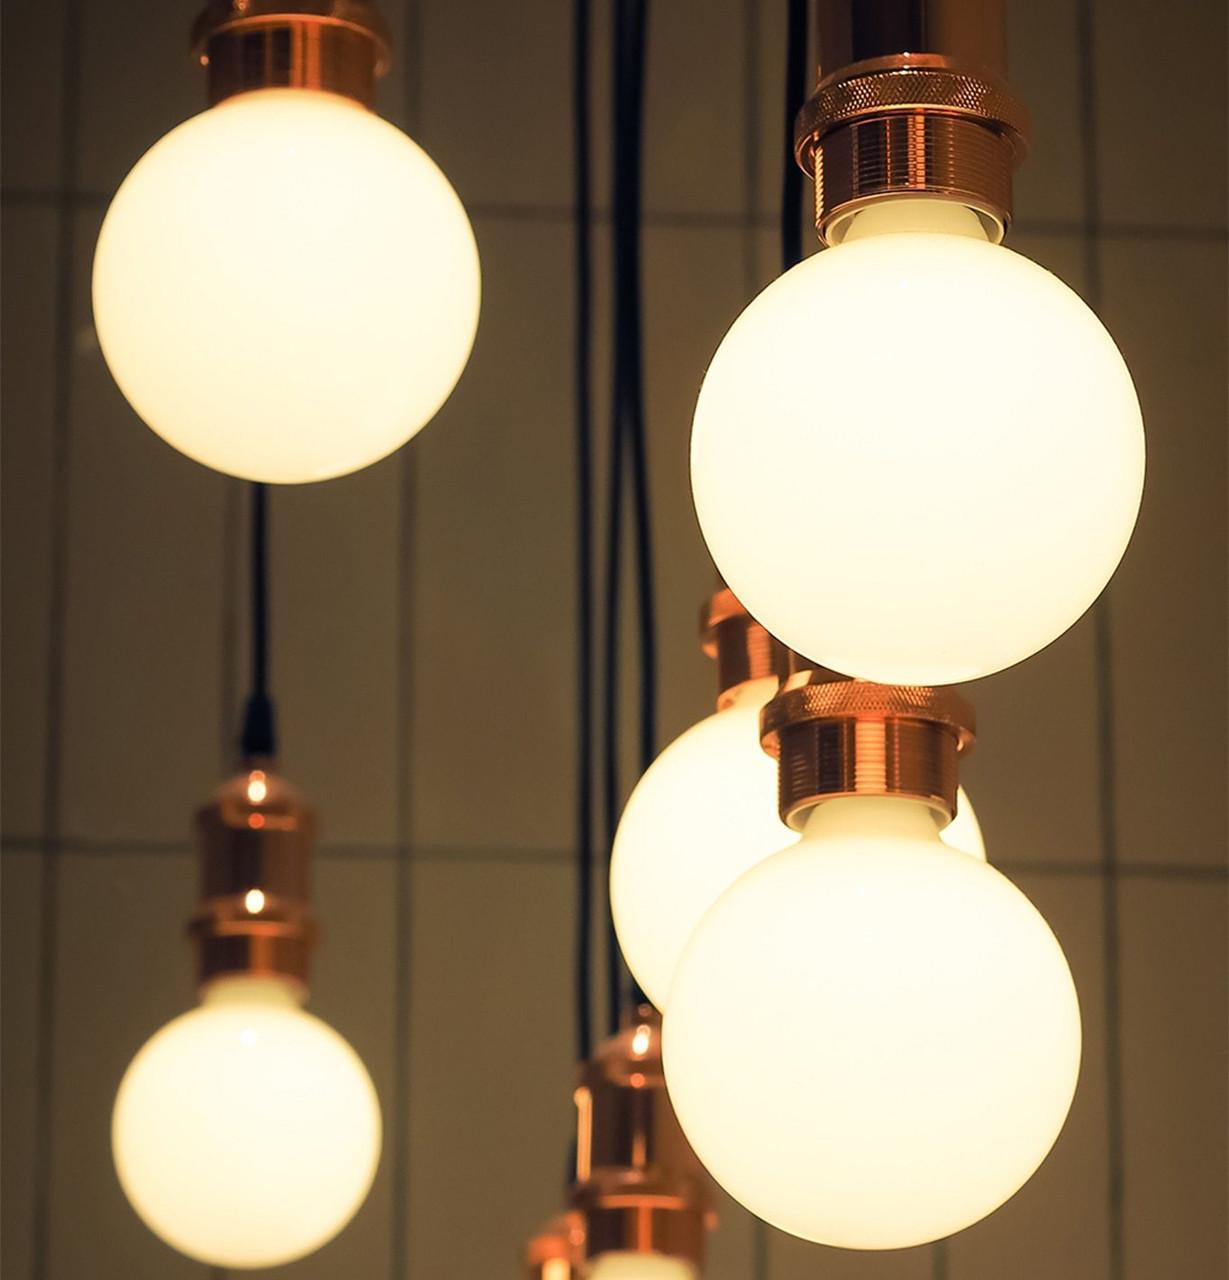 Crompton Lamps LED Globe 7.5 Watt Light Bulbs